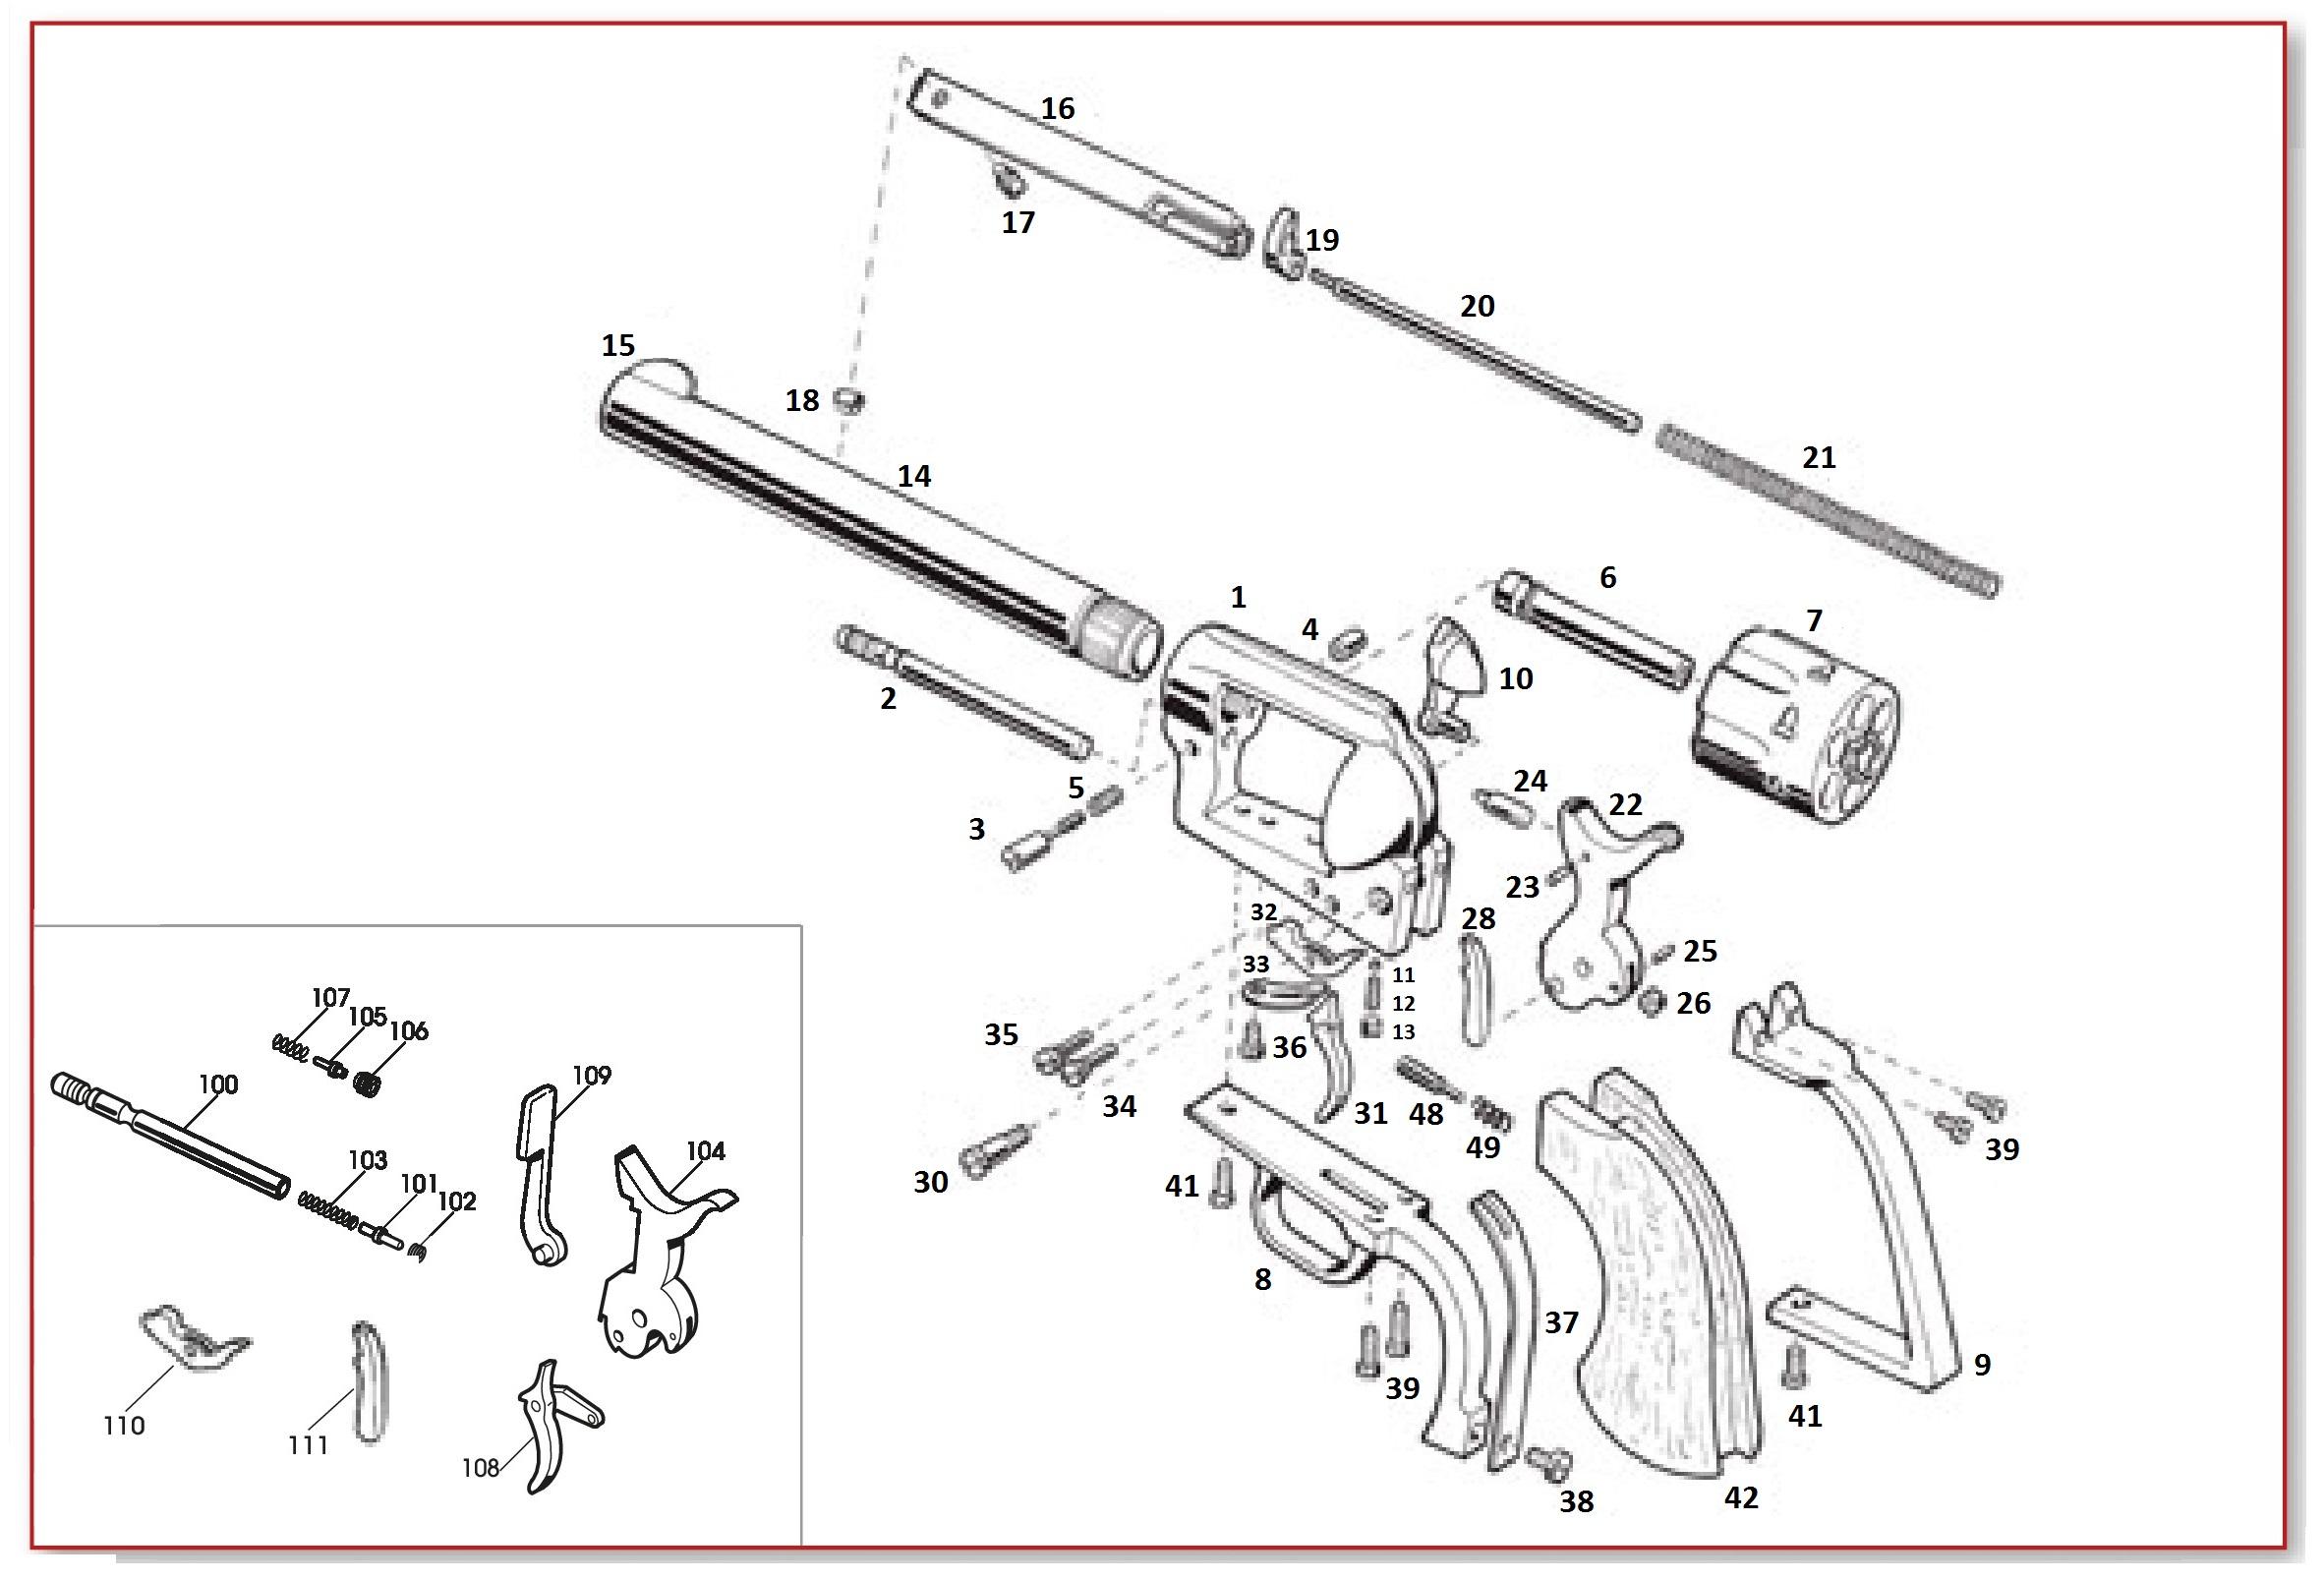 Pietta Single Action Parts - EMF Company